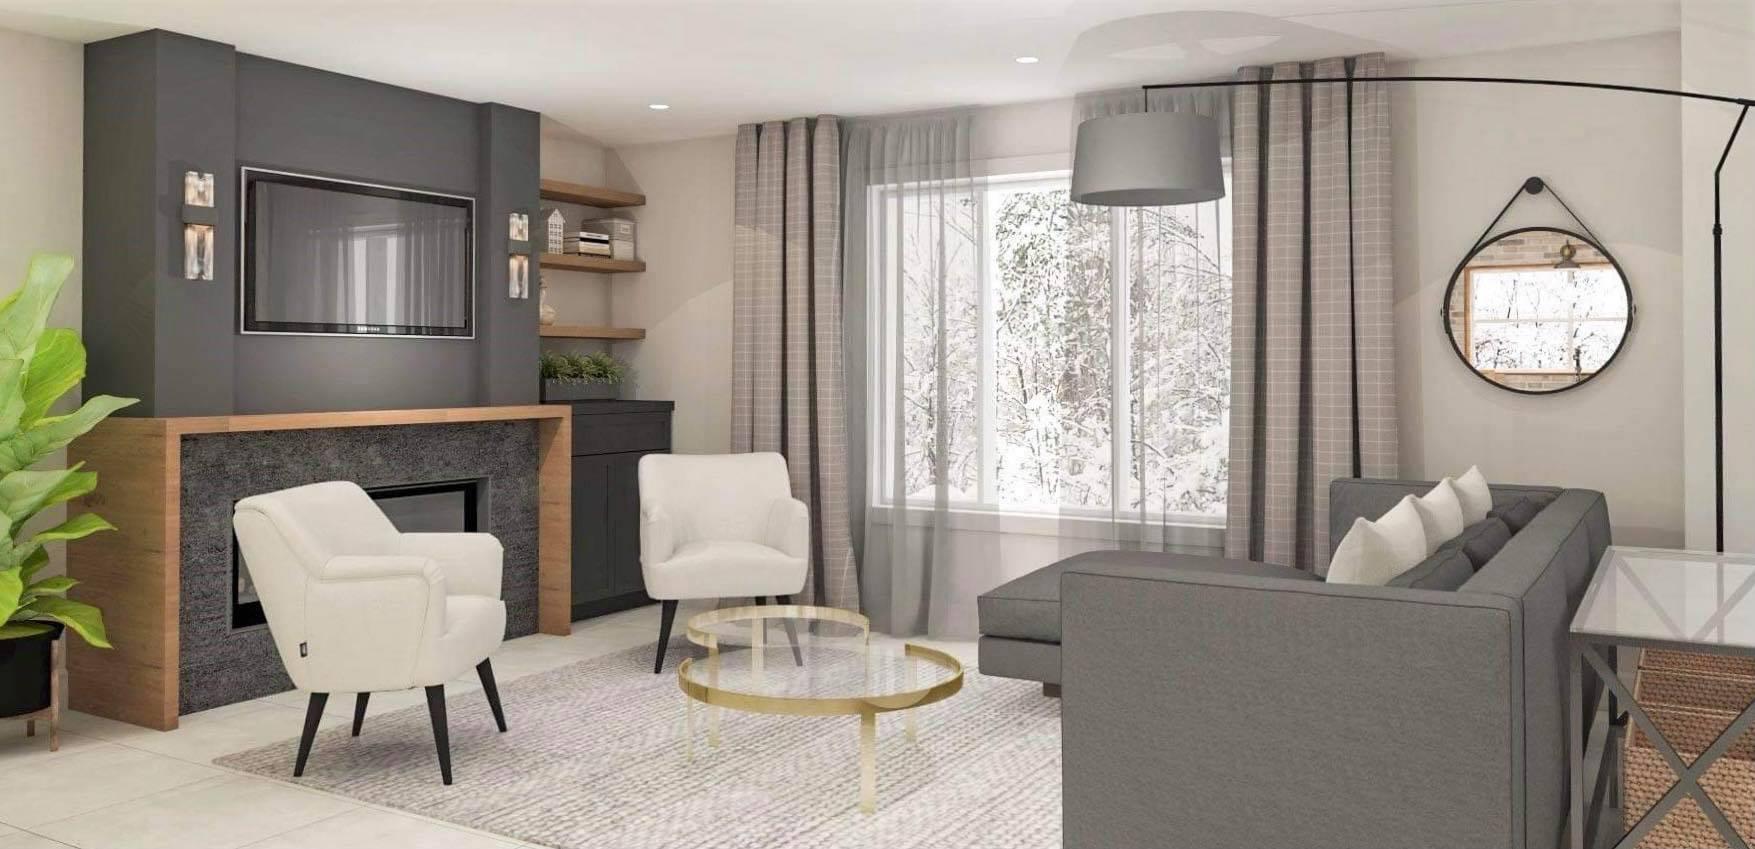 La cour arrière design Struktura 2020 - Salon 2